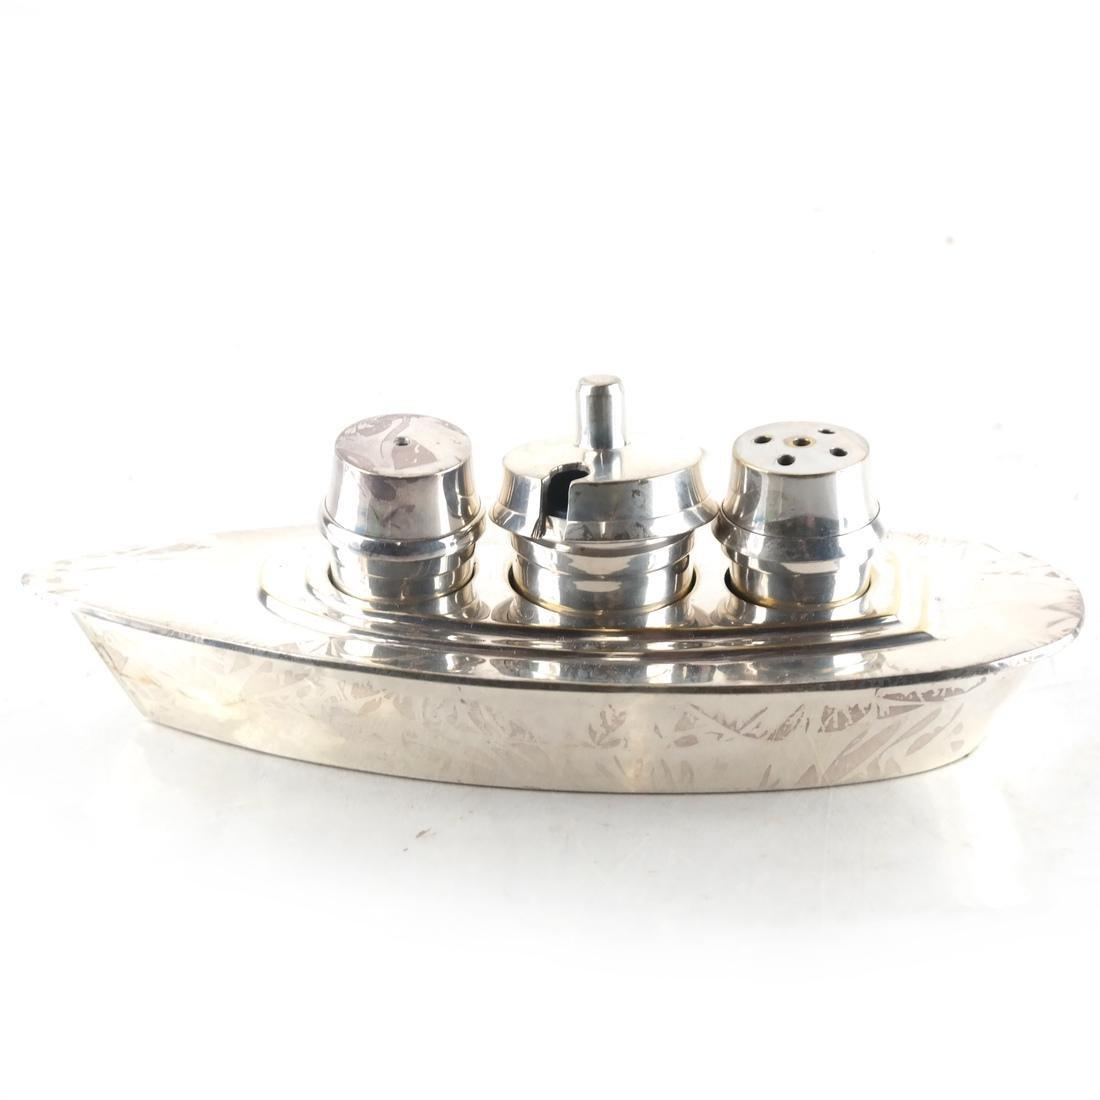 Silver-Plated Boat-Form Cruet - 2